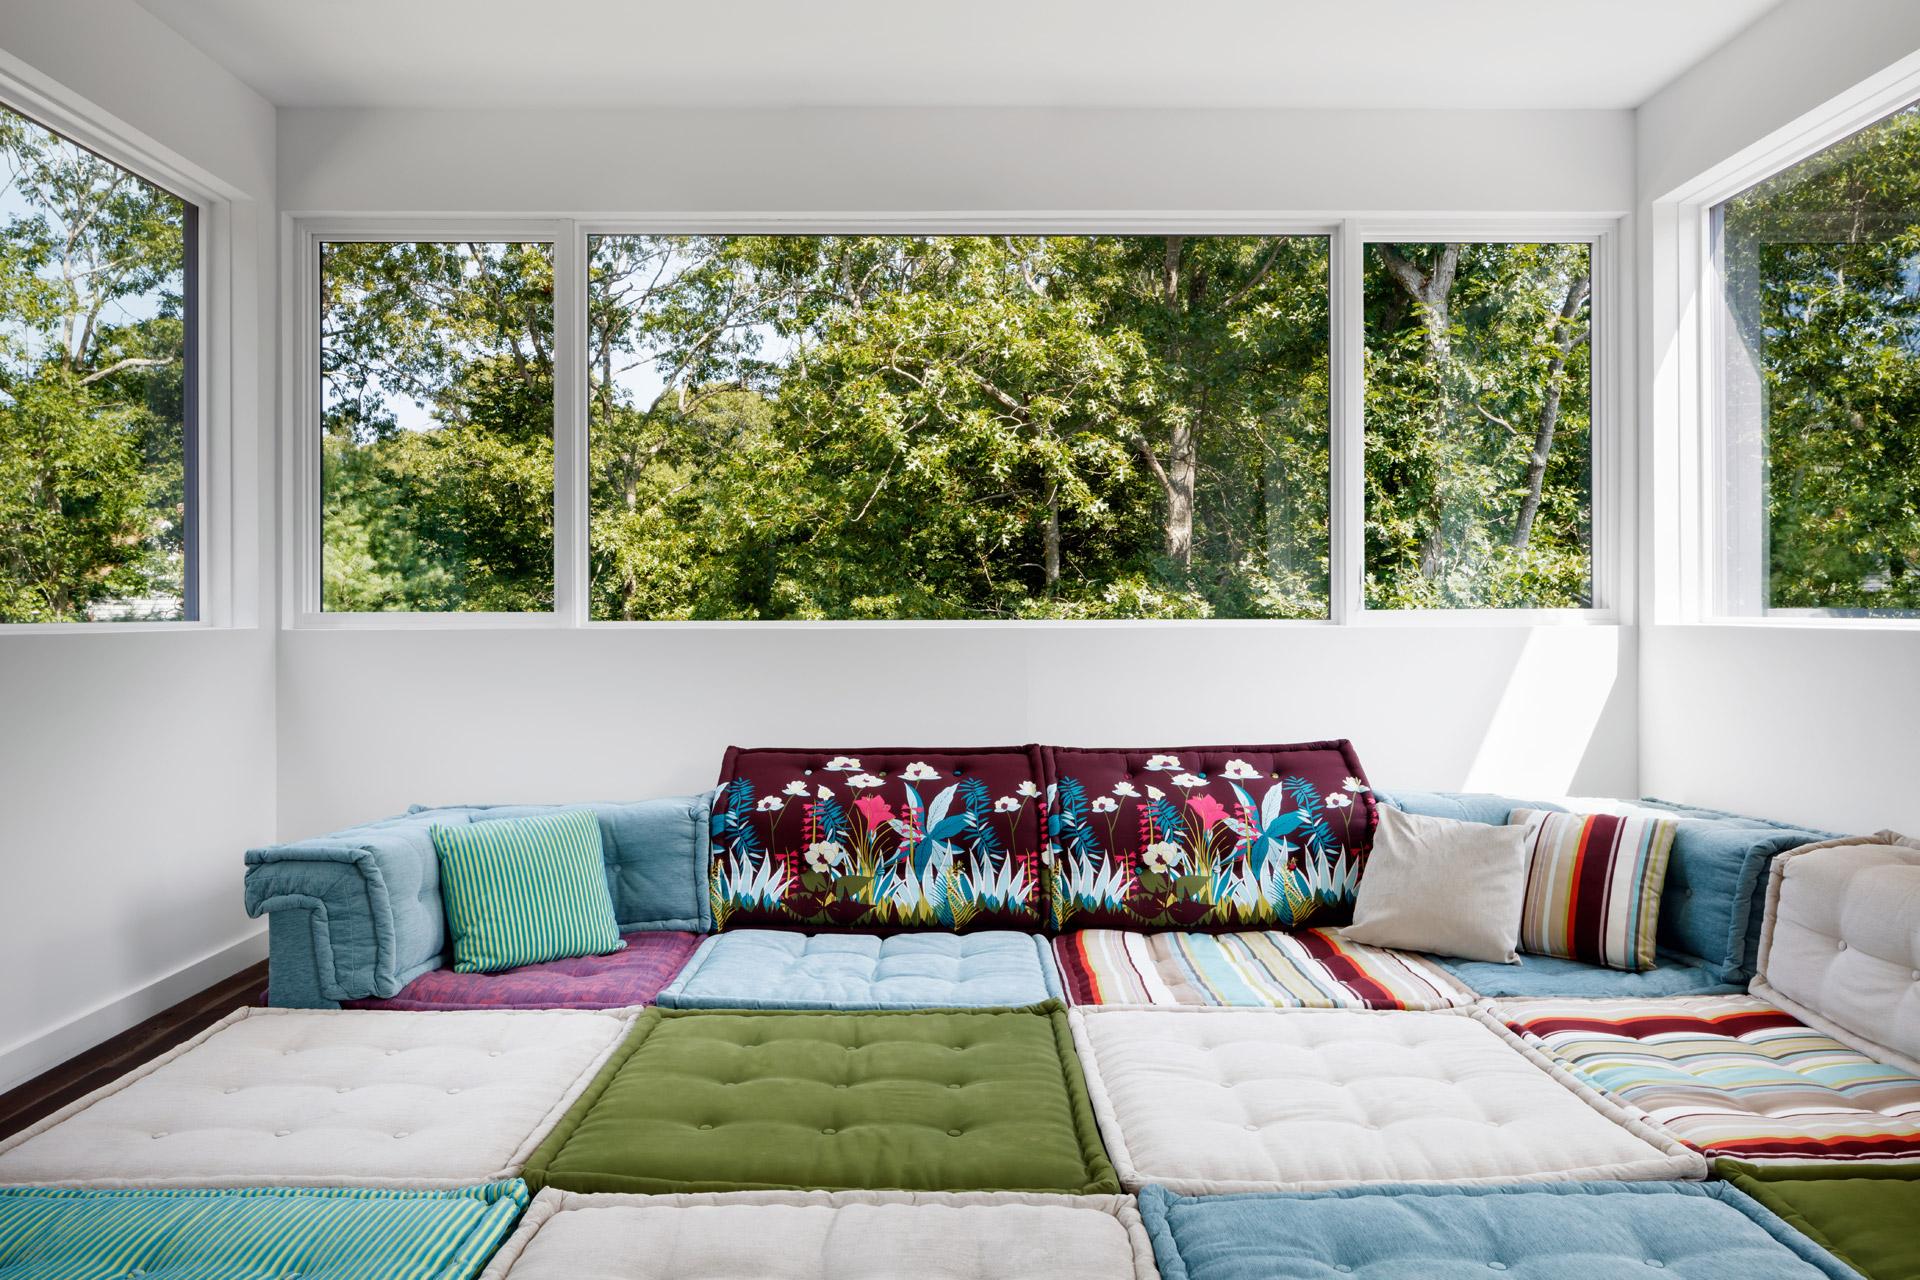 Springs Residence interiors